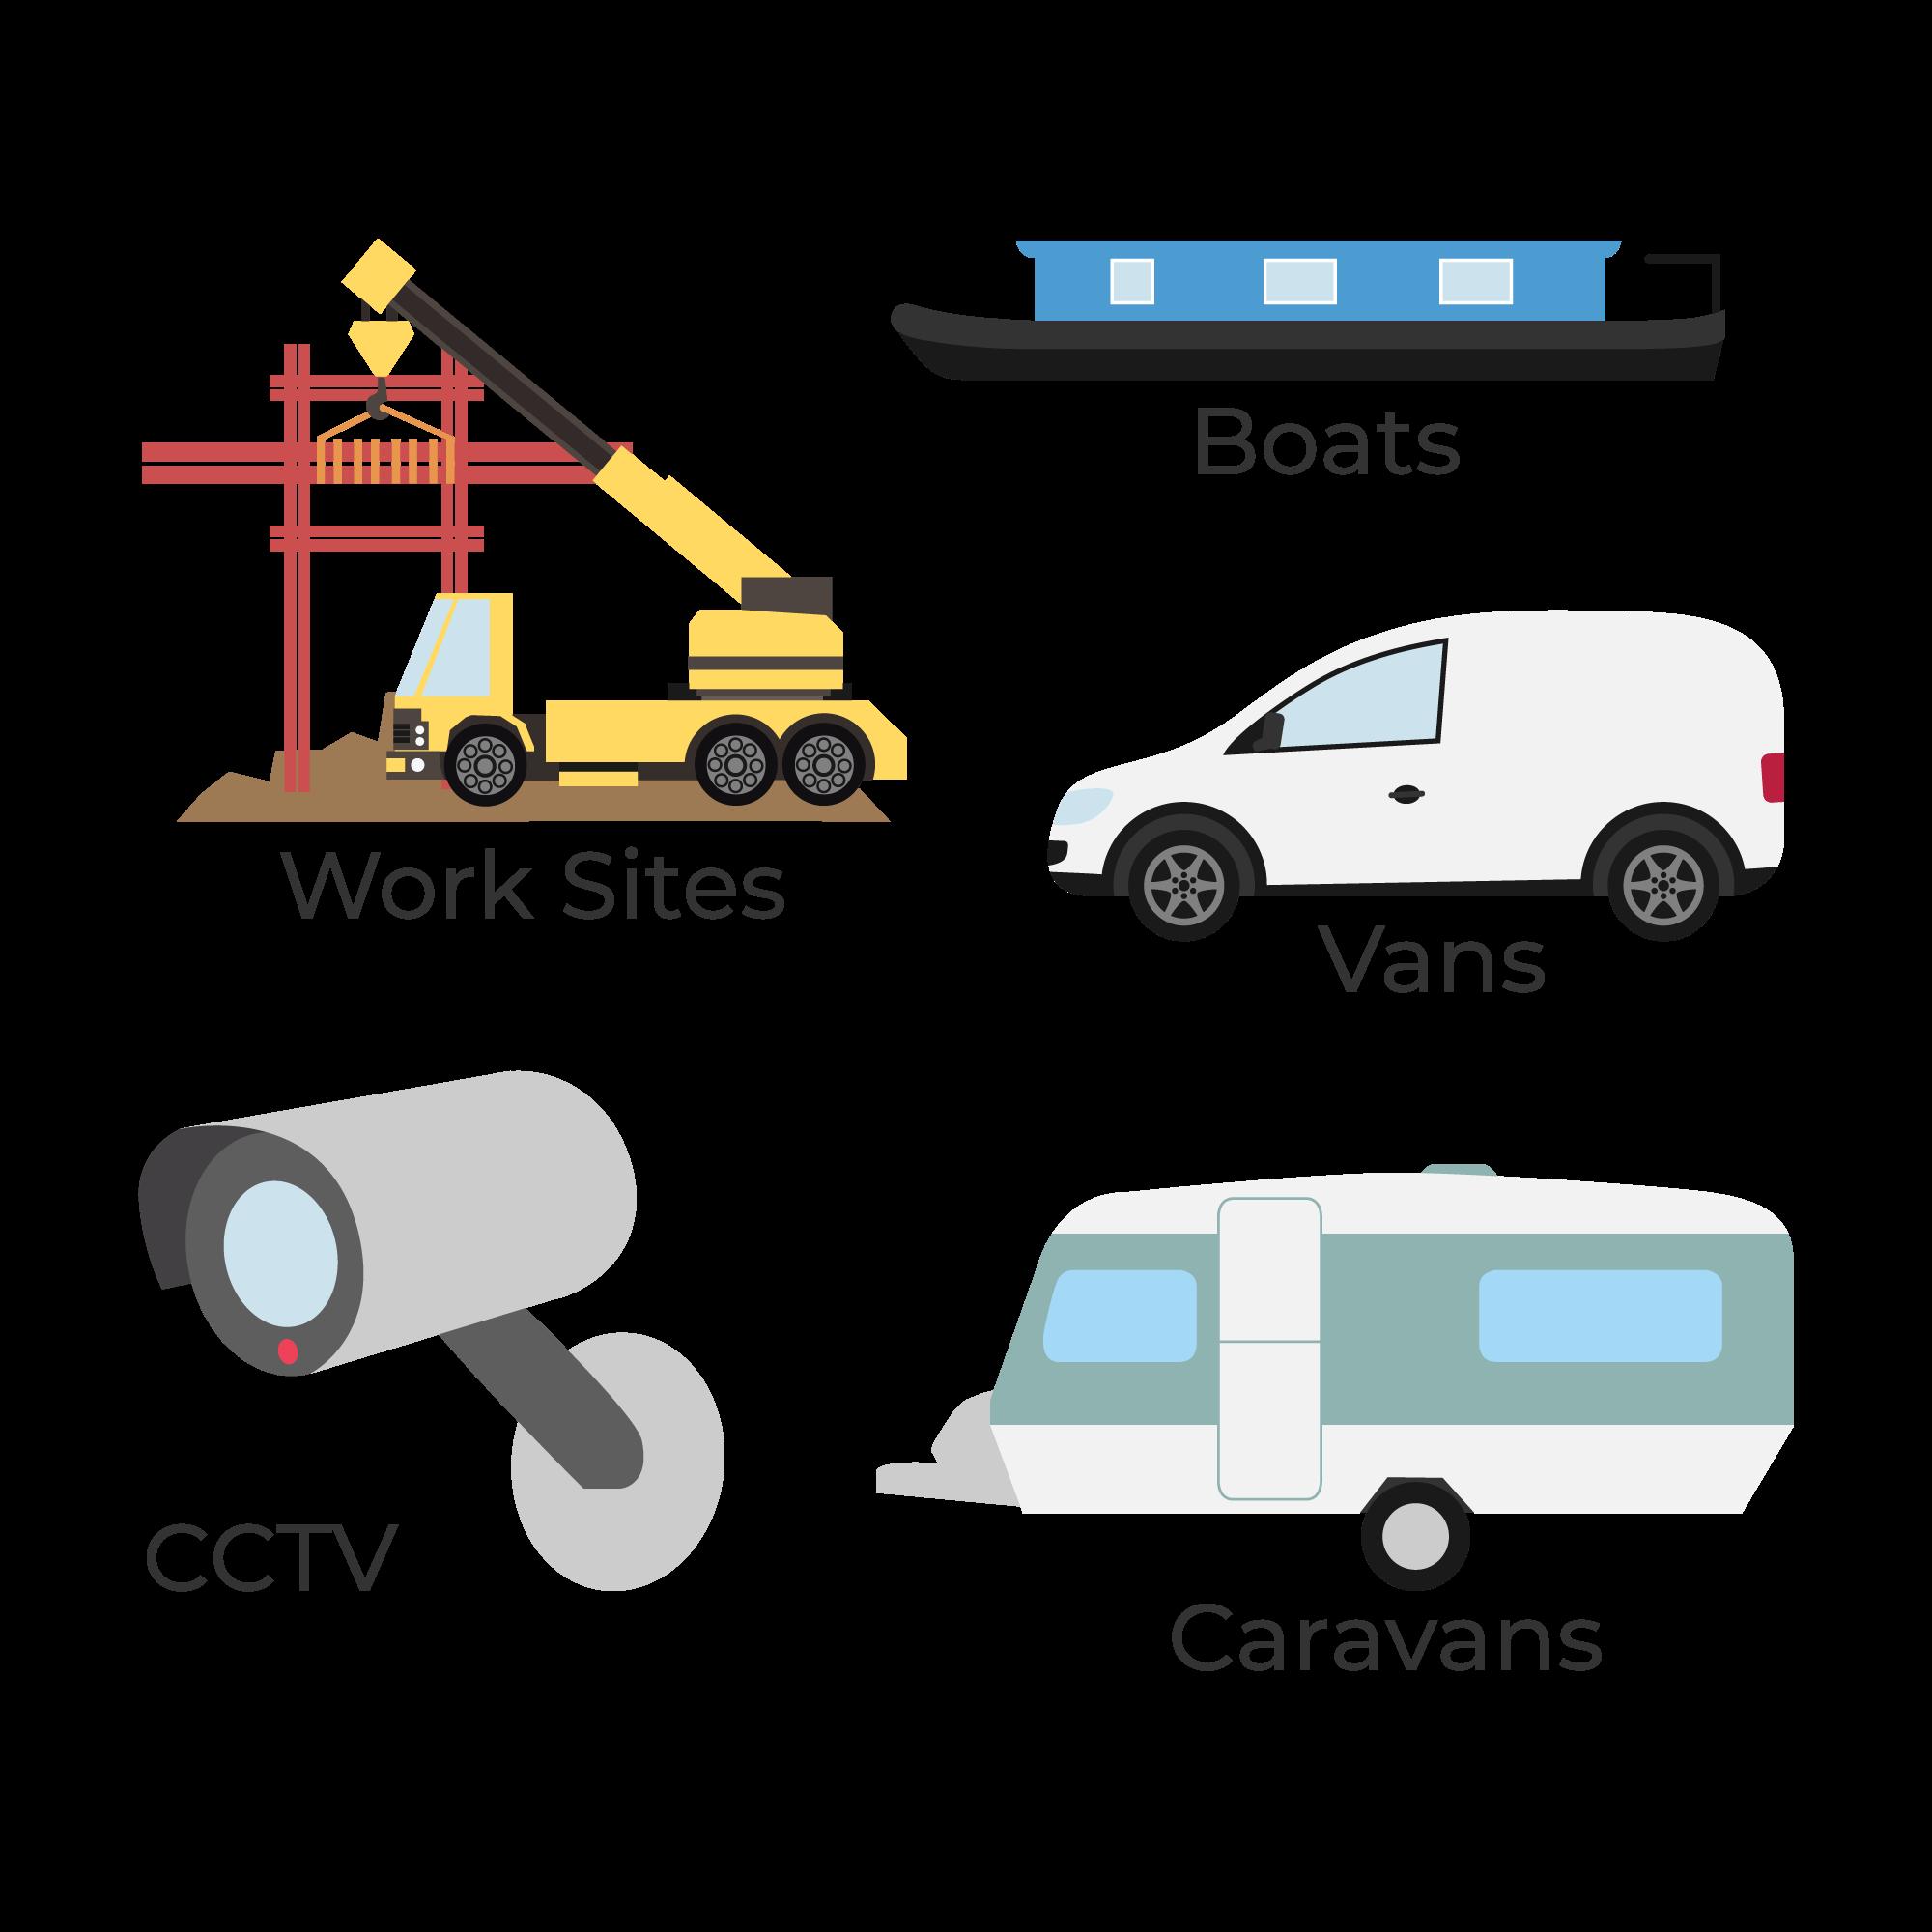 A vector image of boats, work sites, van, caravans, and CCTV